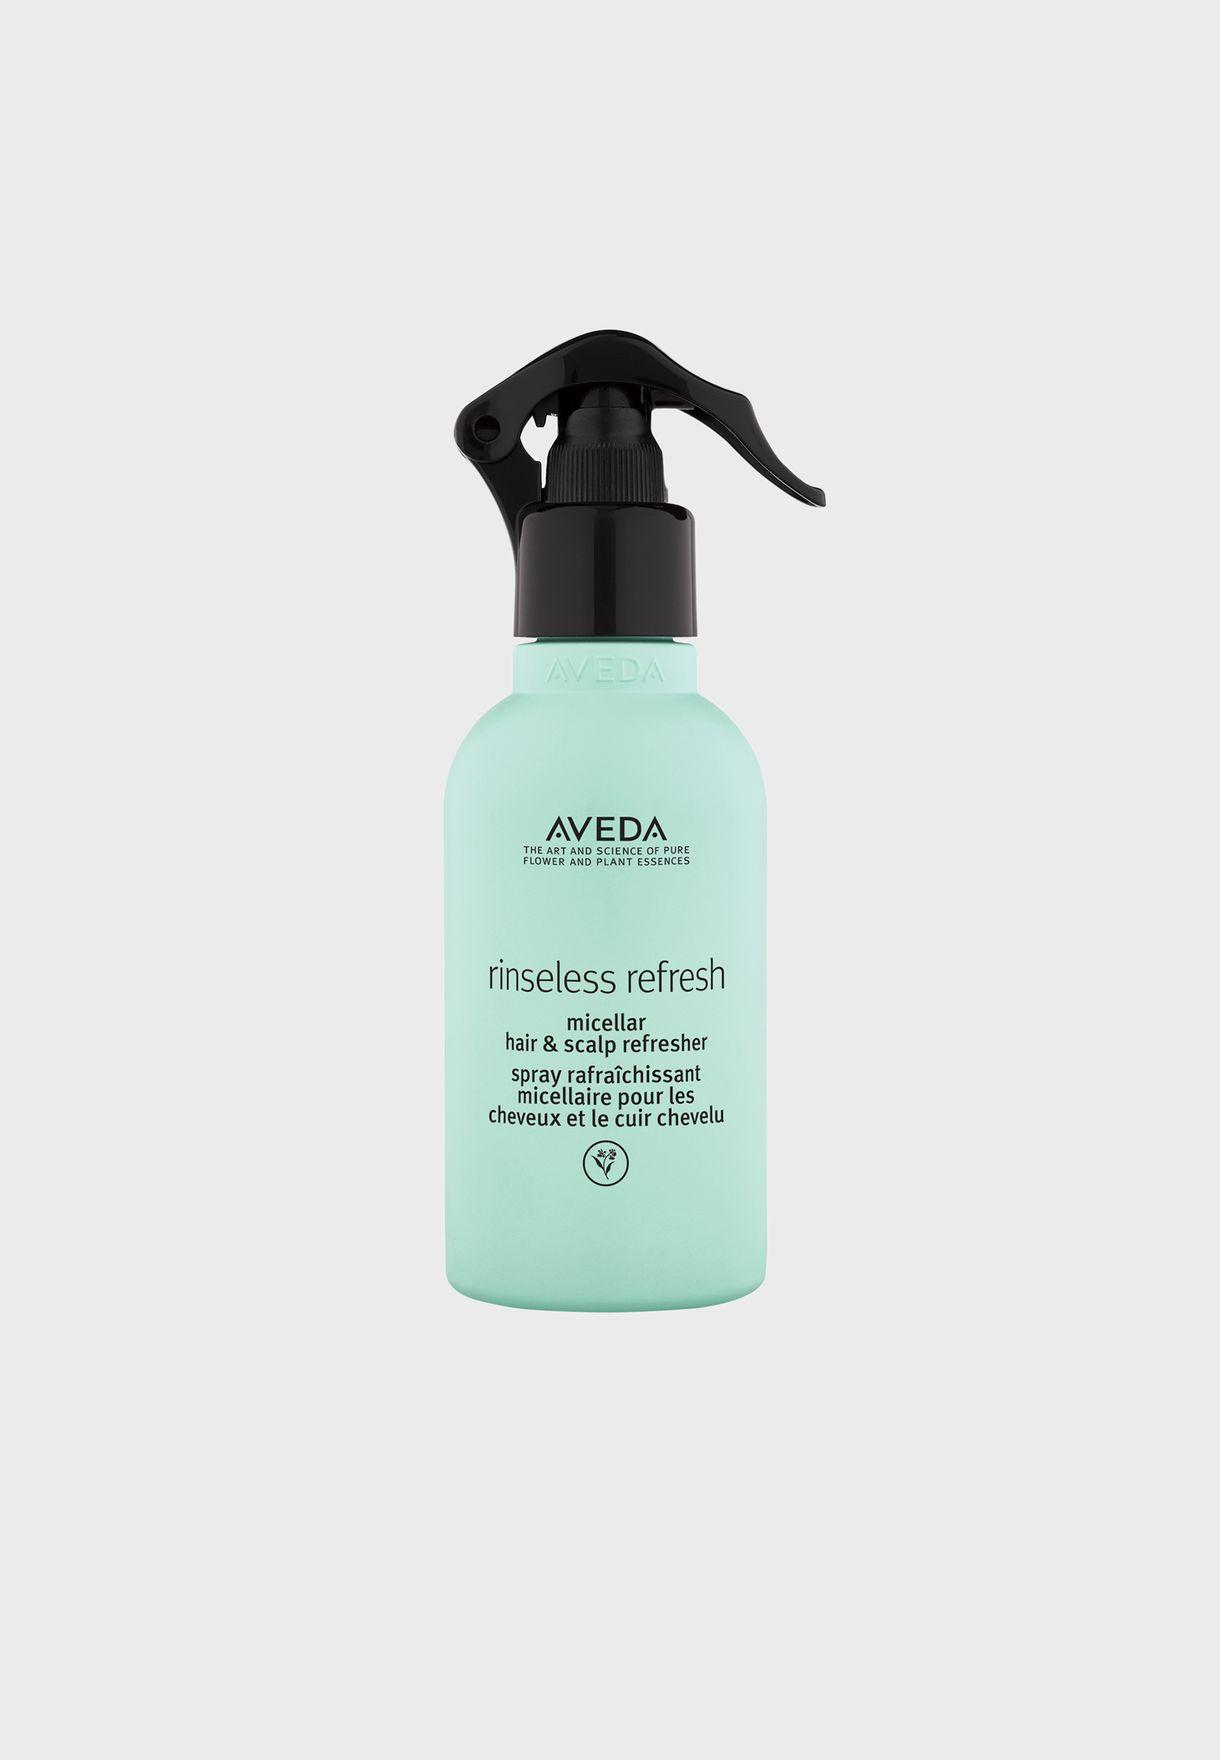 Rinseless Refresh Hair & Scalp Refresher 200ml